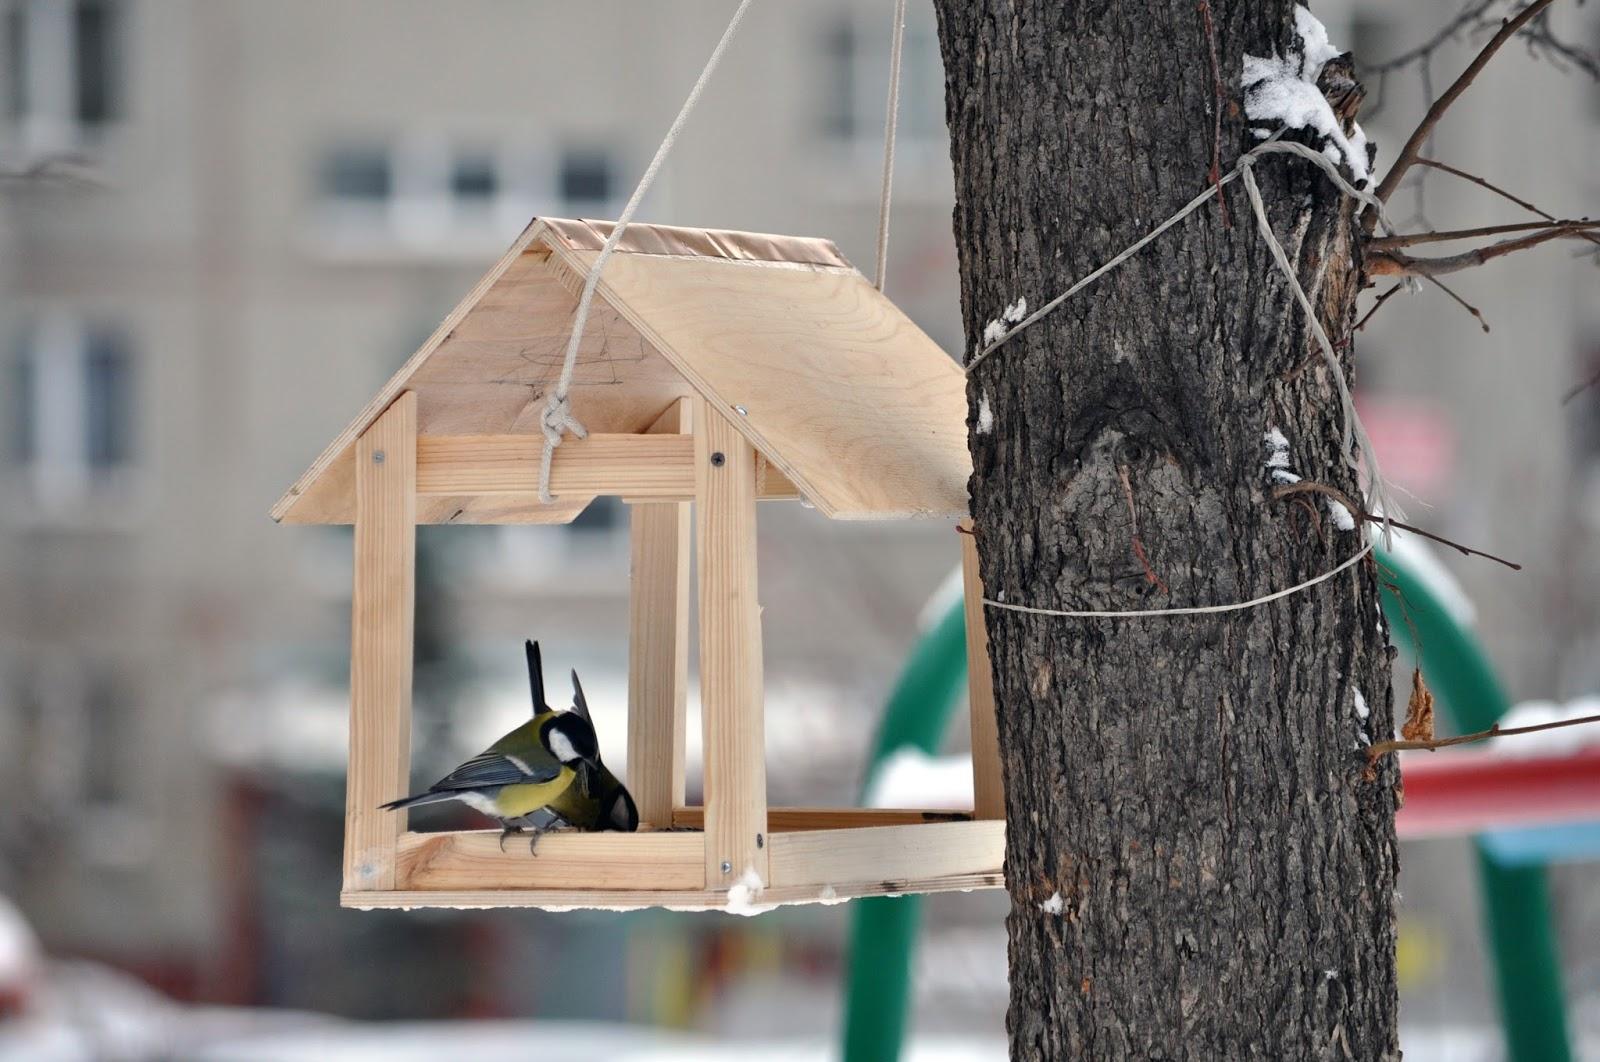 театр картинки птиц на кармушках спокойной ночи